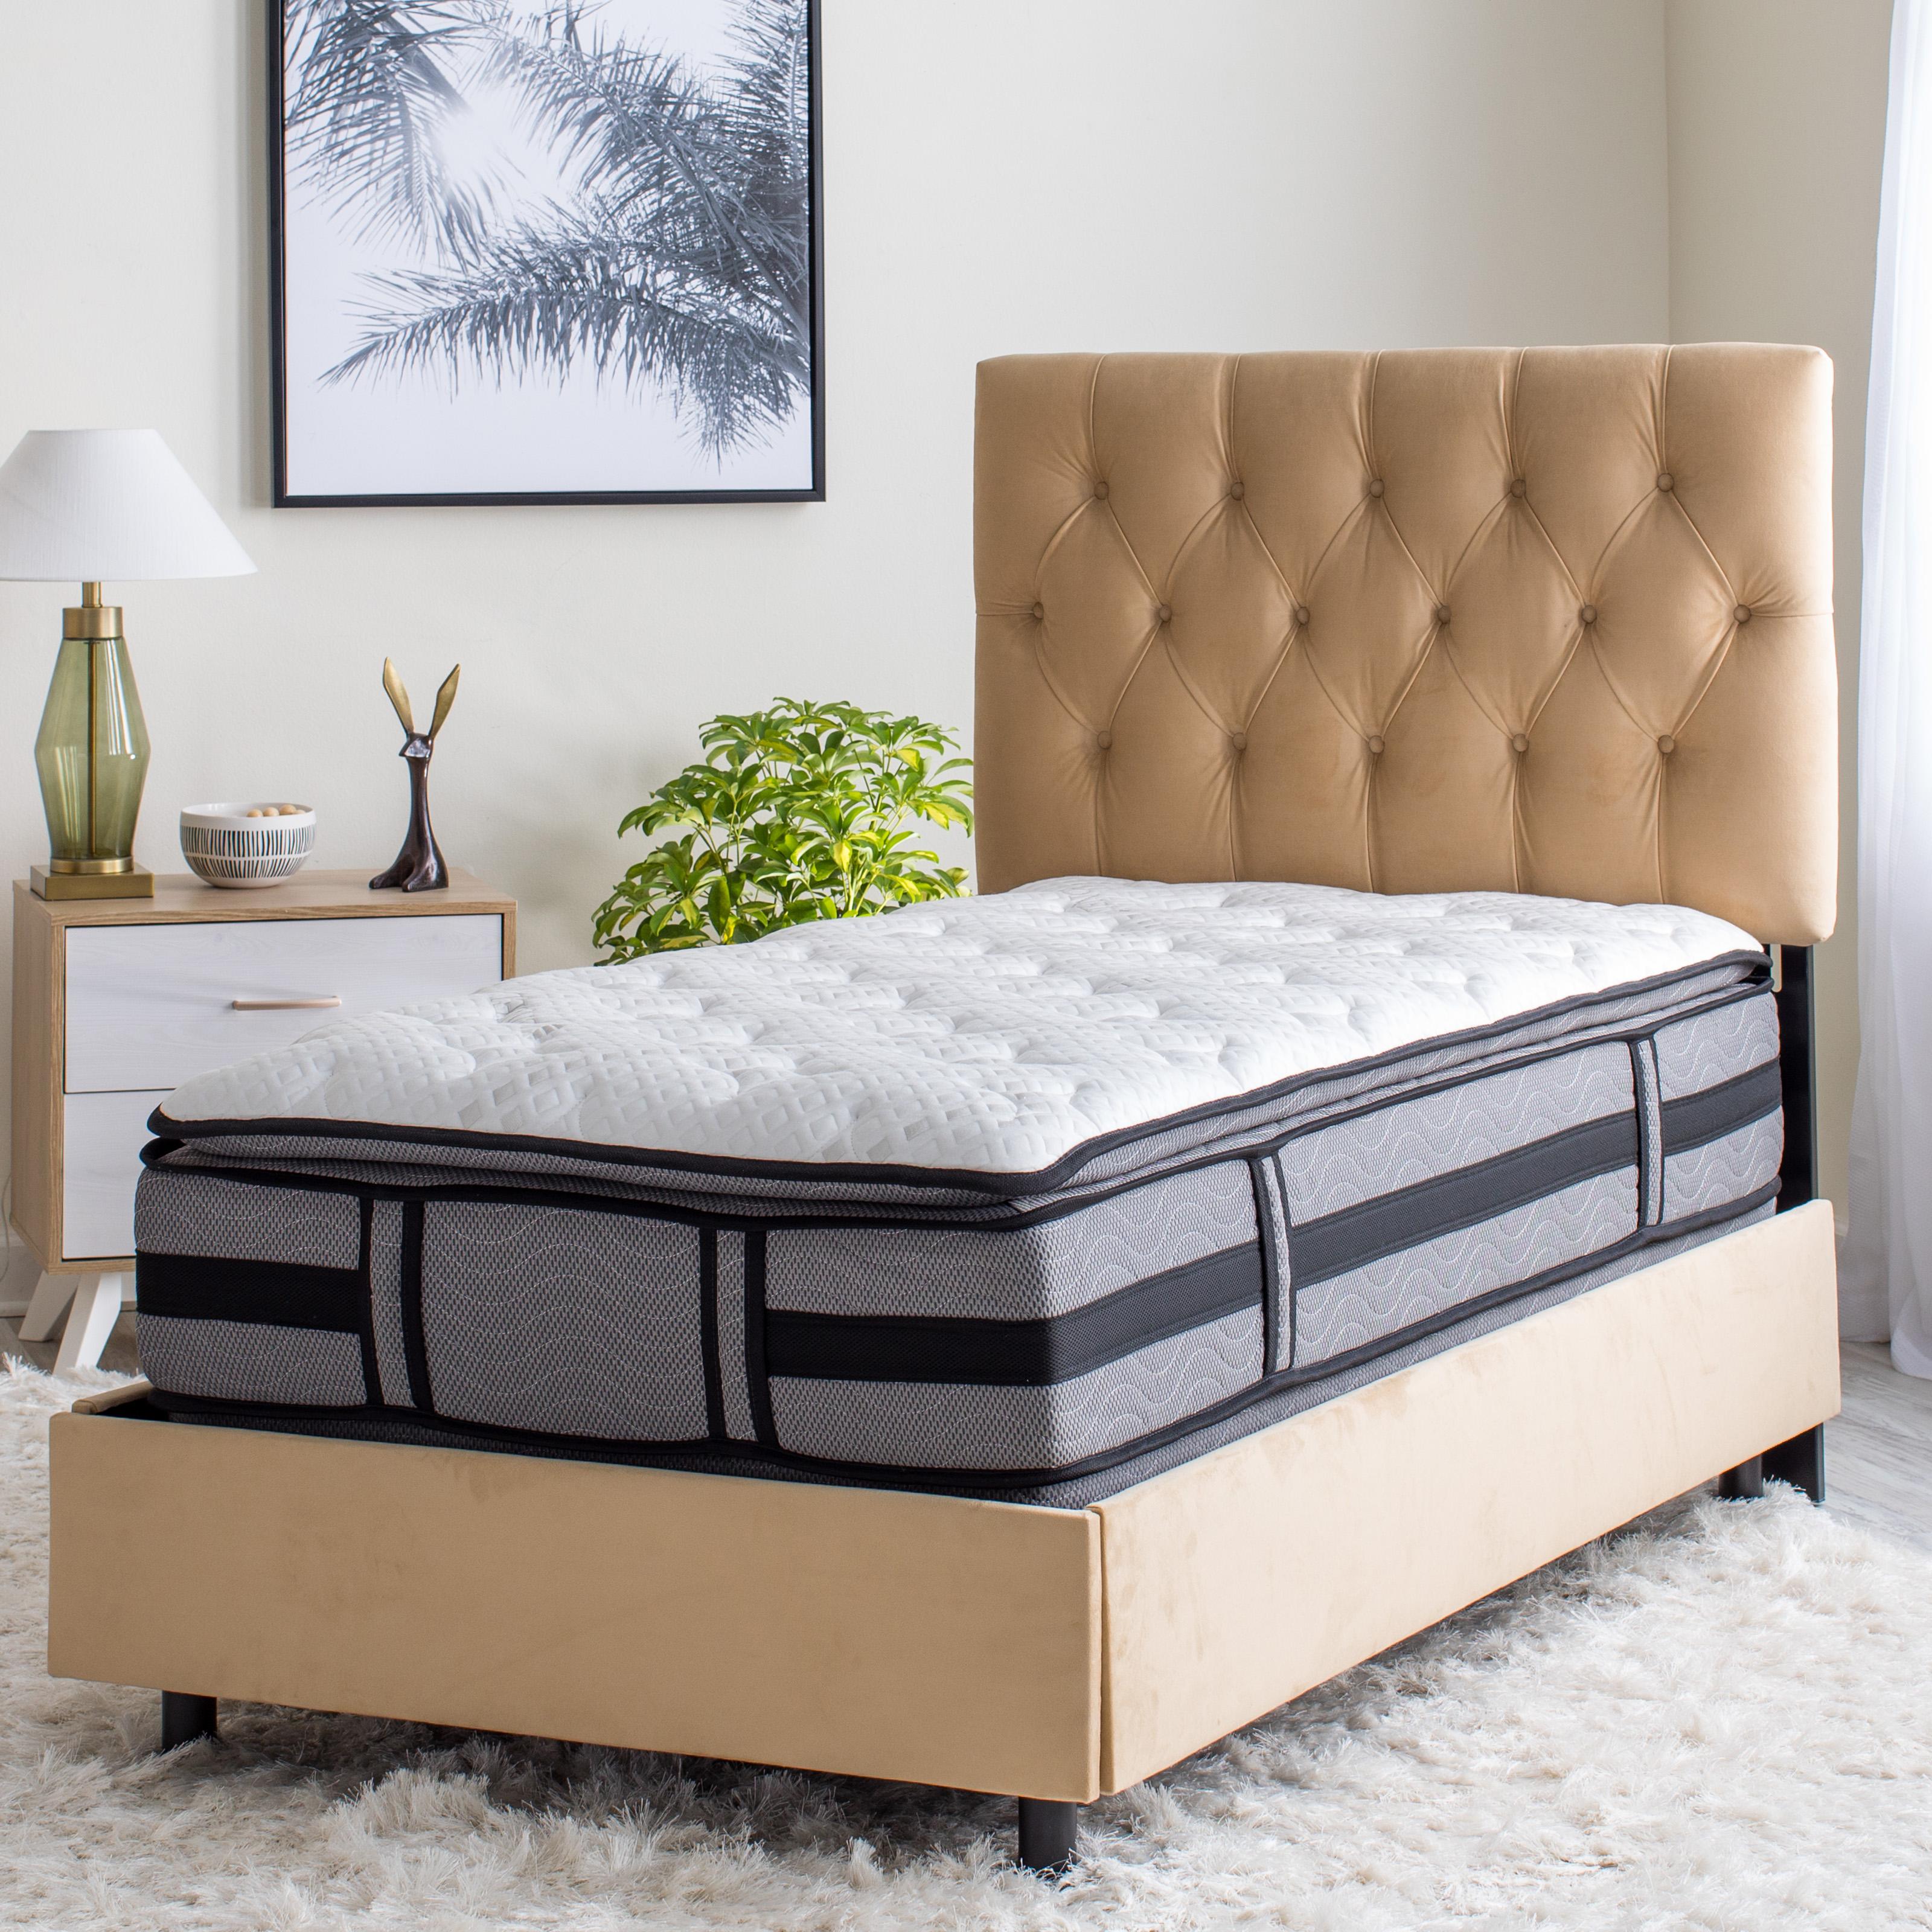 pocket spring memory foam king full size compressed natural latex mattress - Jozy Mattress | Jozy.net